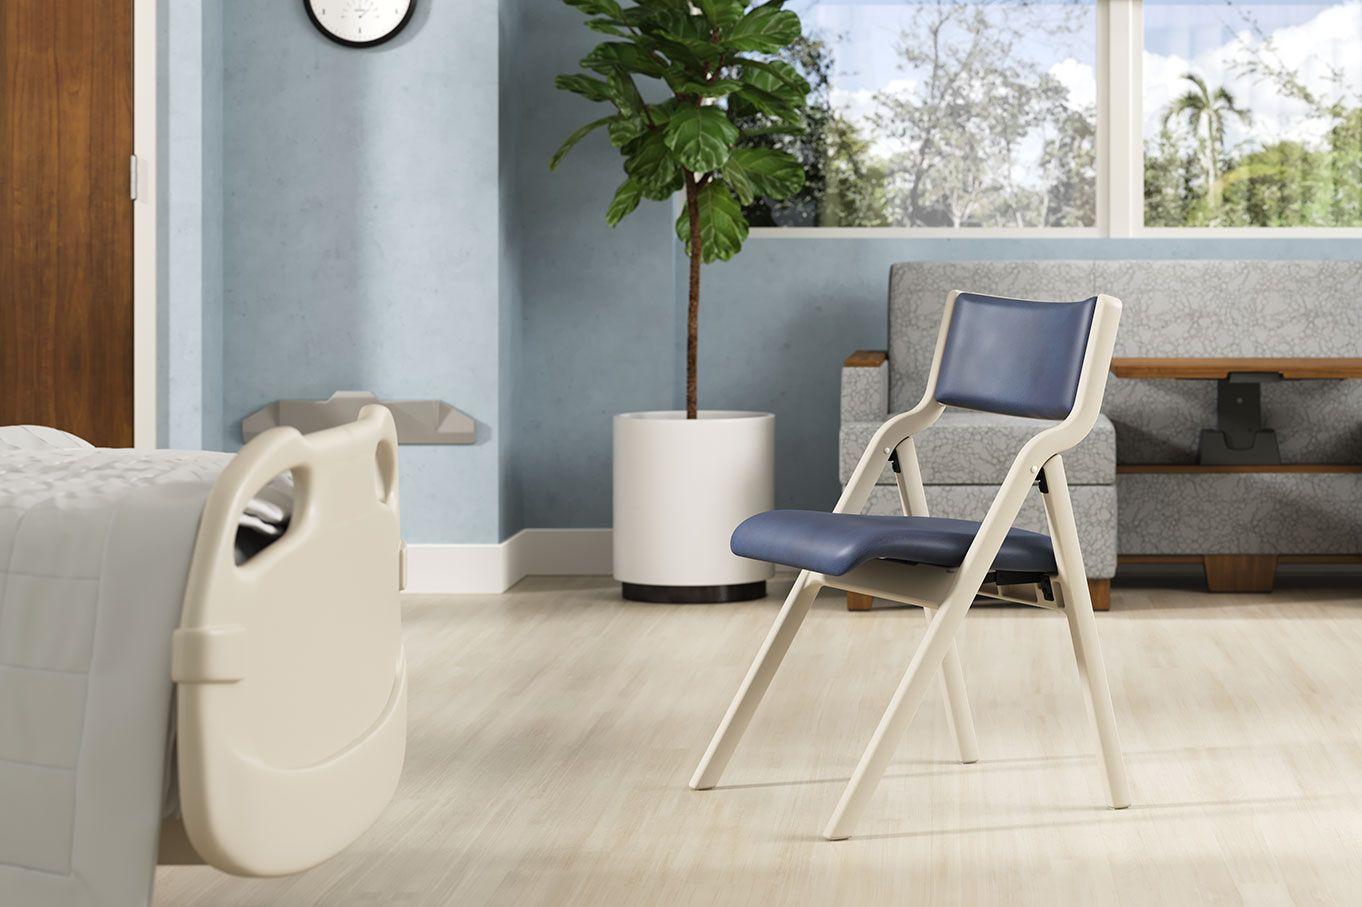 Perk Folding Chair with sleepToo® Wieland Healthcare